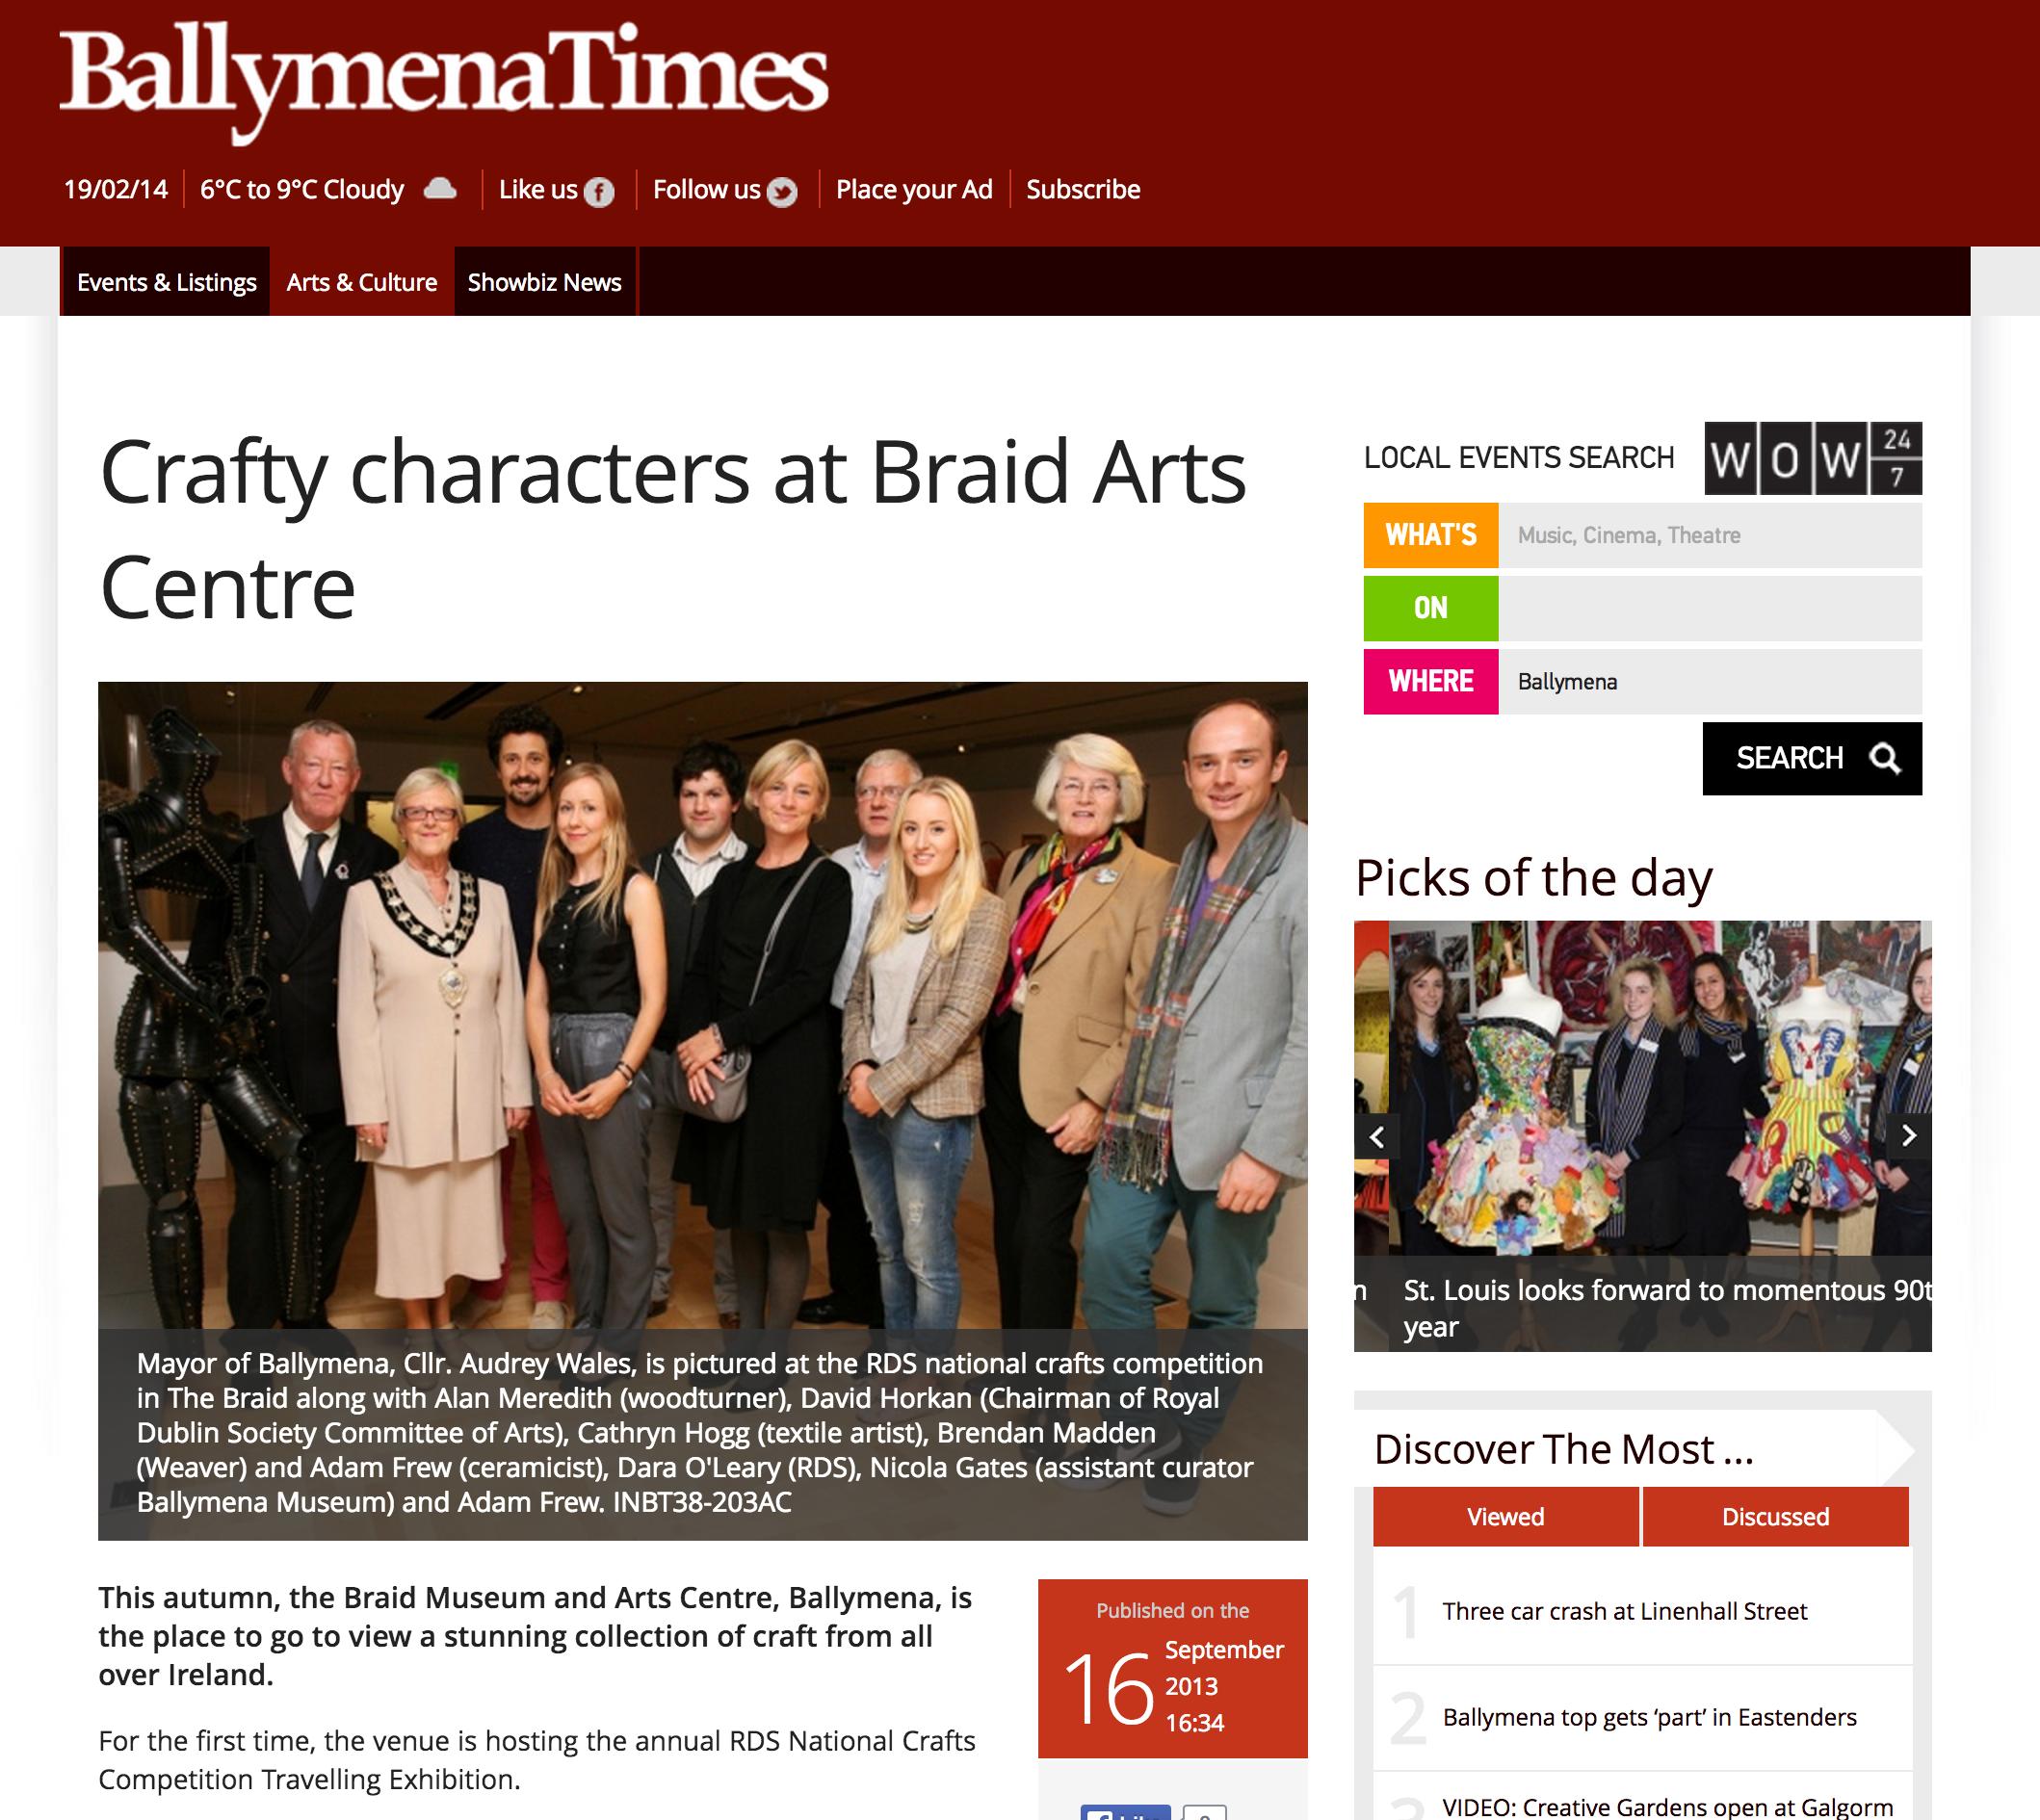 Ballymena Times Crafty Characters at Braid Arts Centre